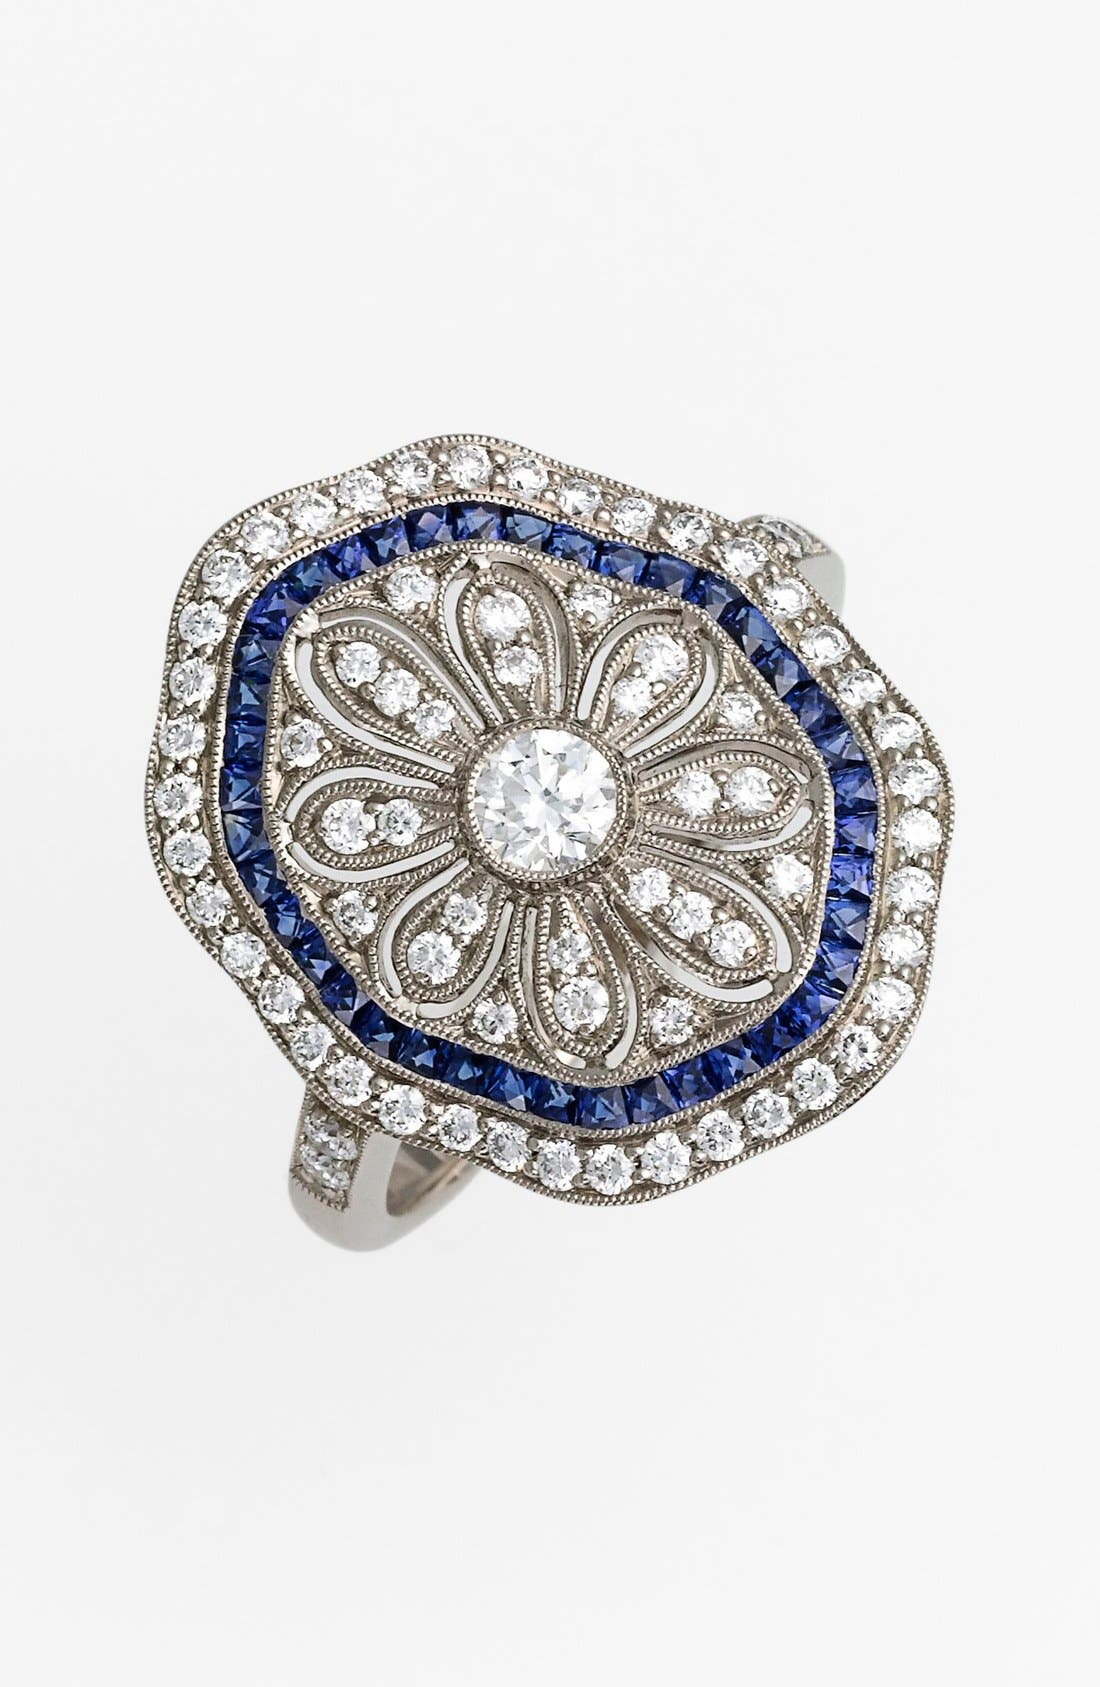 Alternate Image 1 Selected - Kwiat 'Vintage' Diamond & Blue Sapphire Octagon Ring